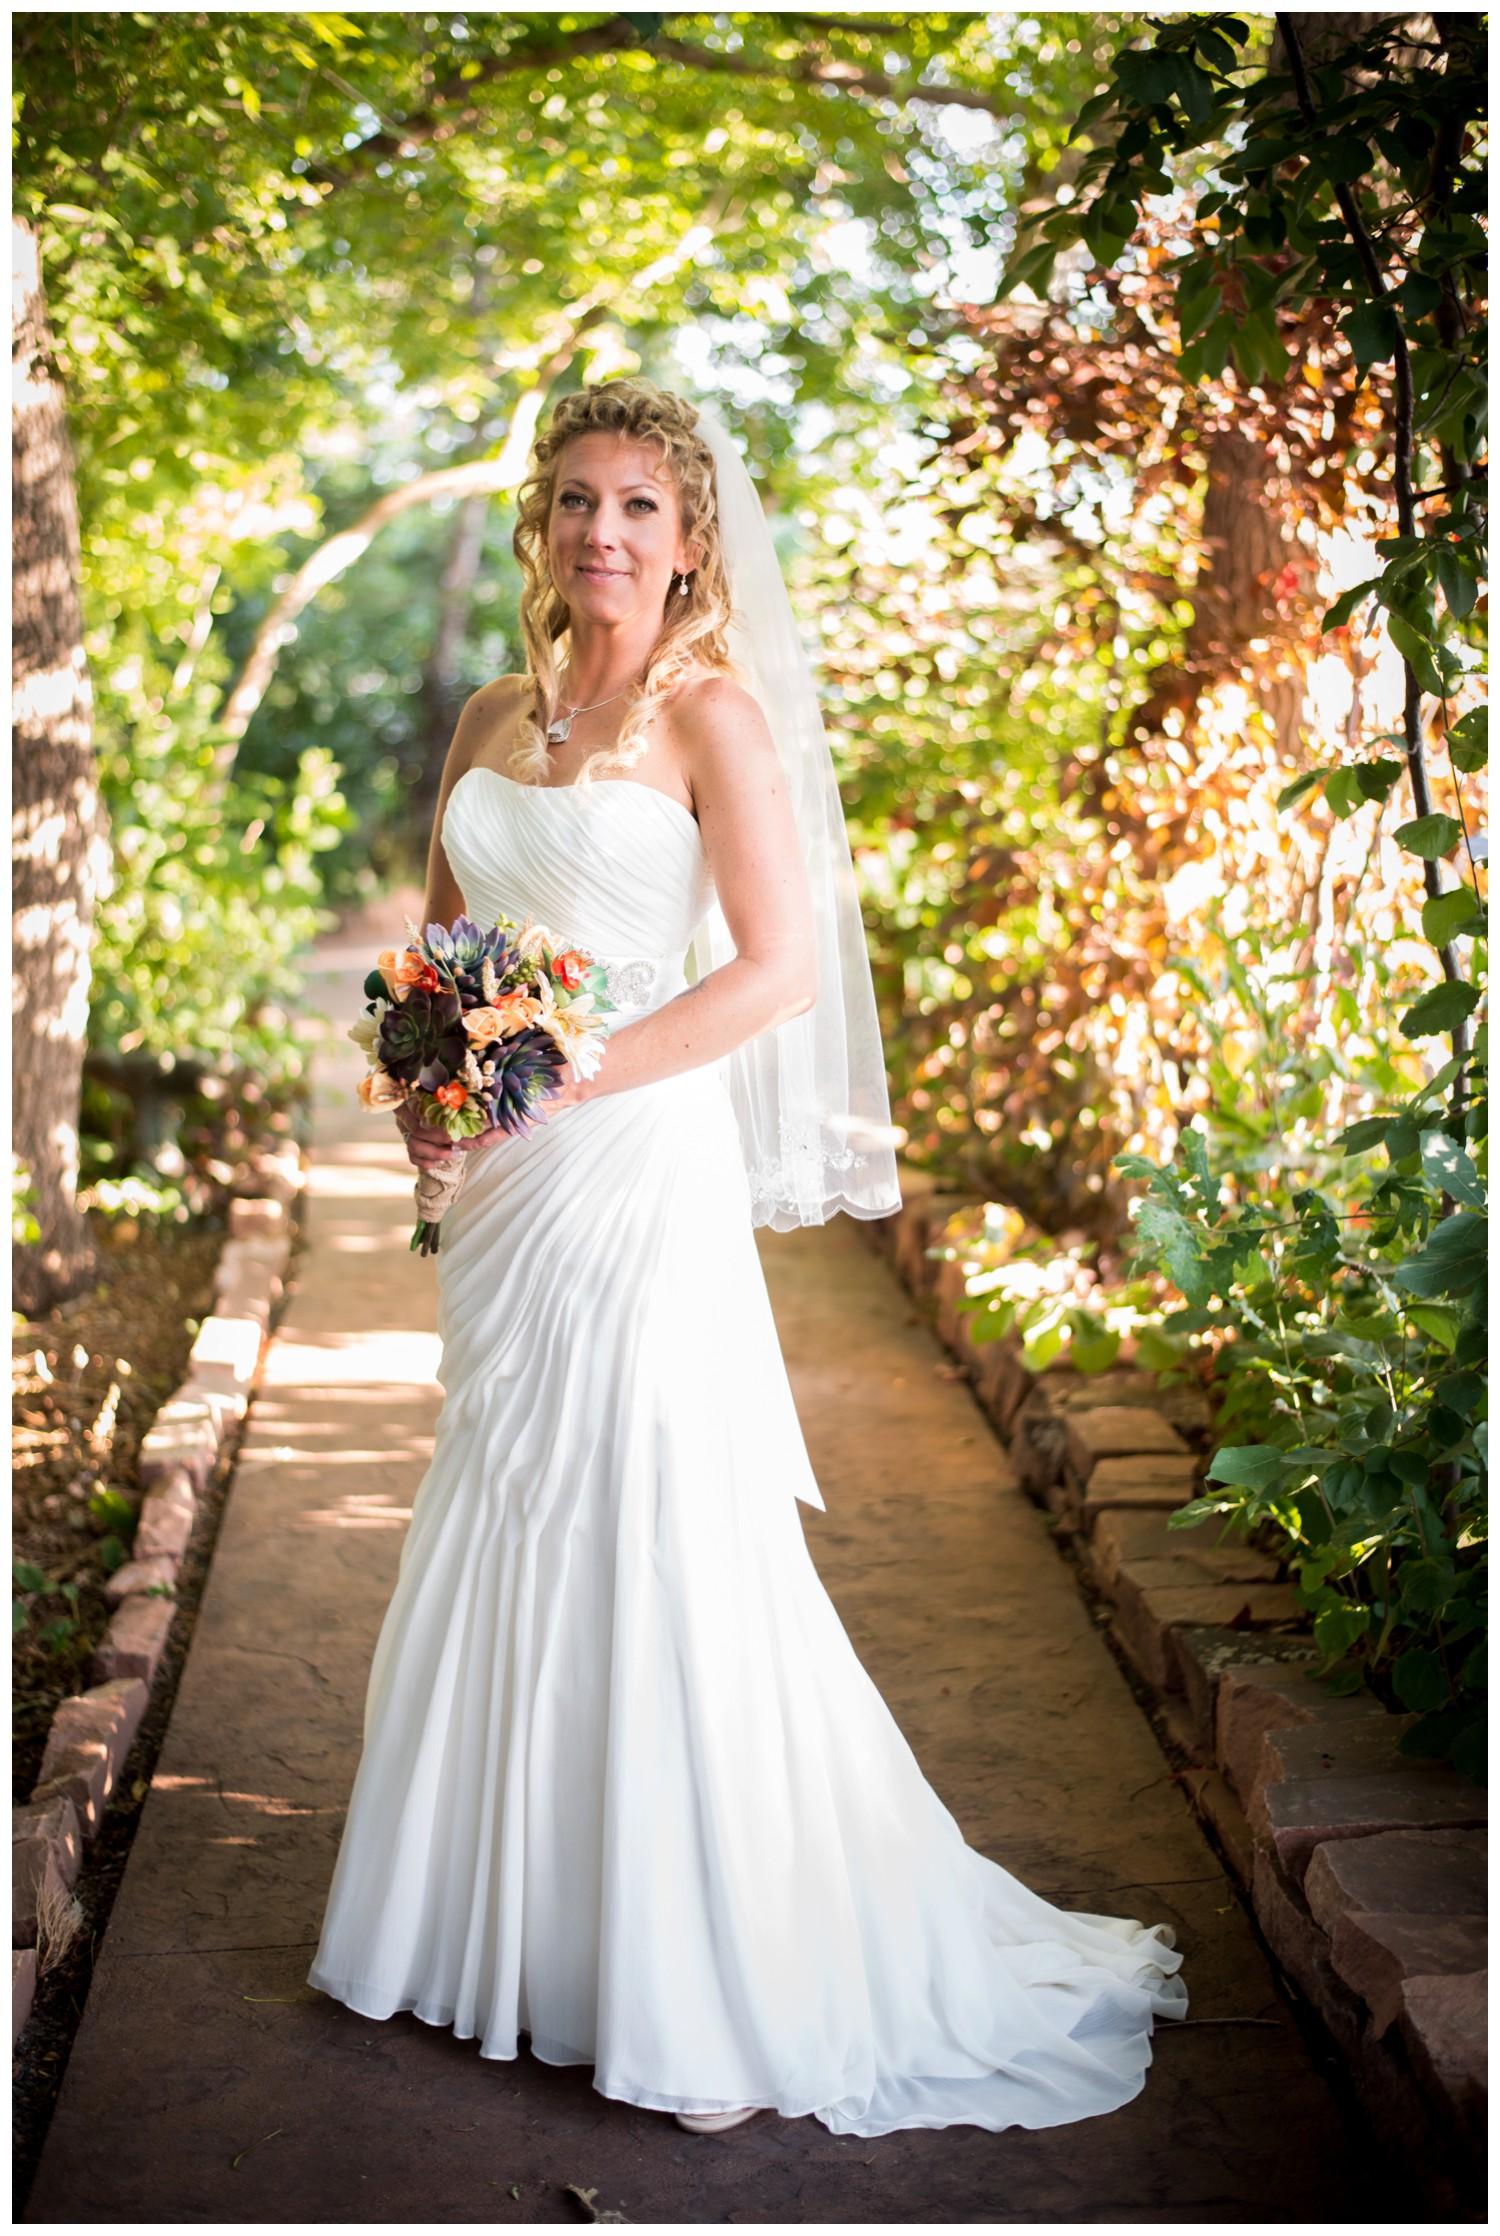 Morningside-manor-colorado-outdoor-wedding-photography_0043.jpg